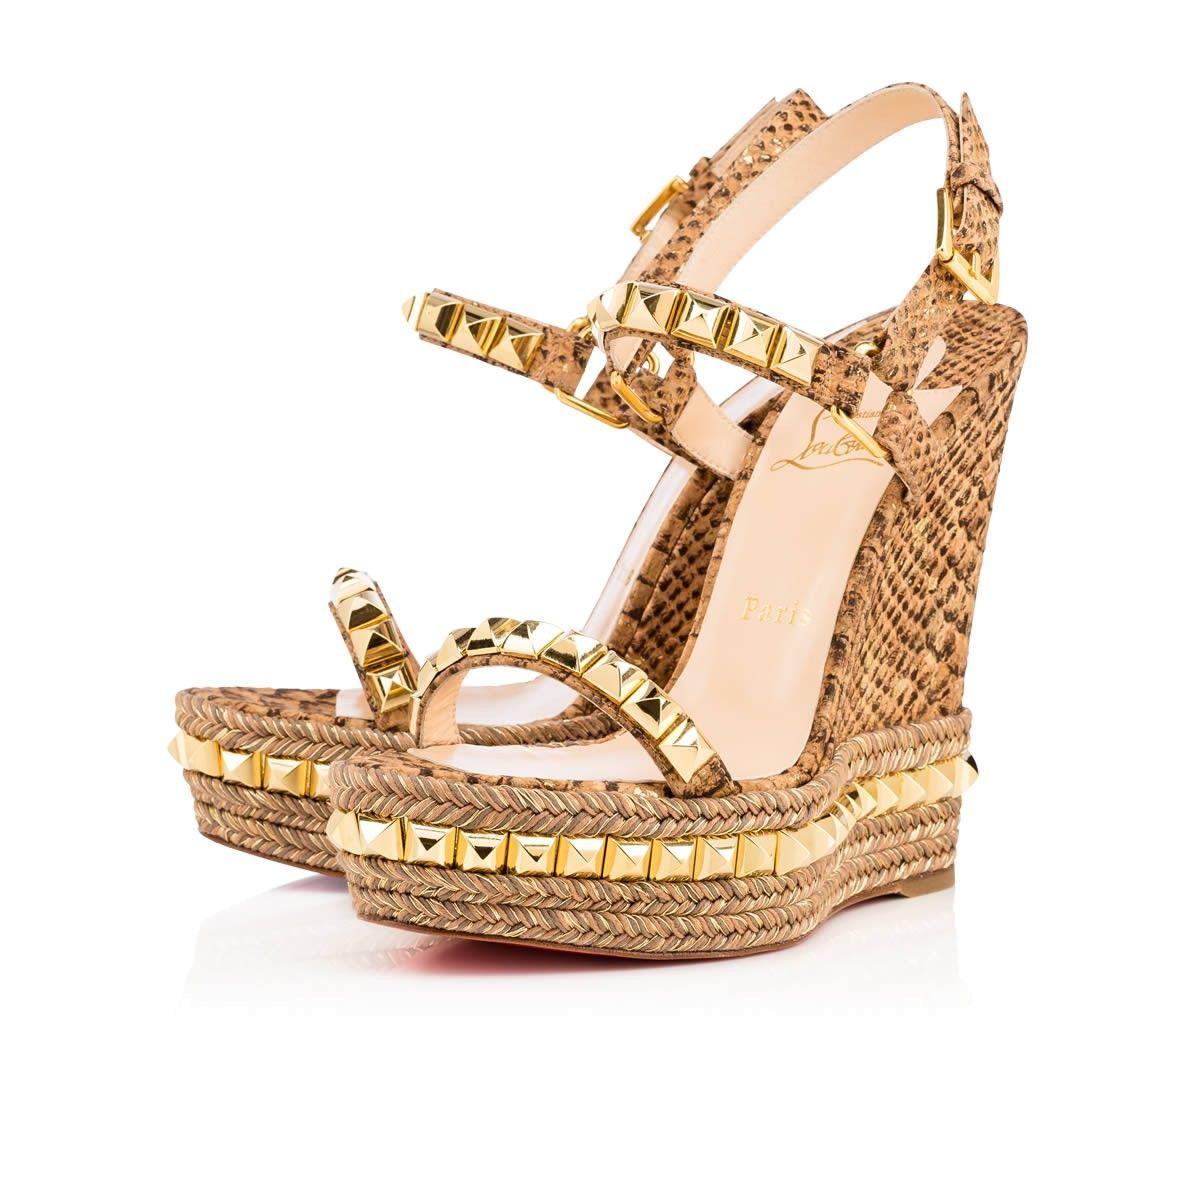 e445a6e221f Shoes - Cataclou 140 Cork Ecorce Cork - Christian Louboutin